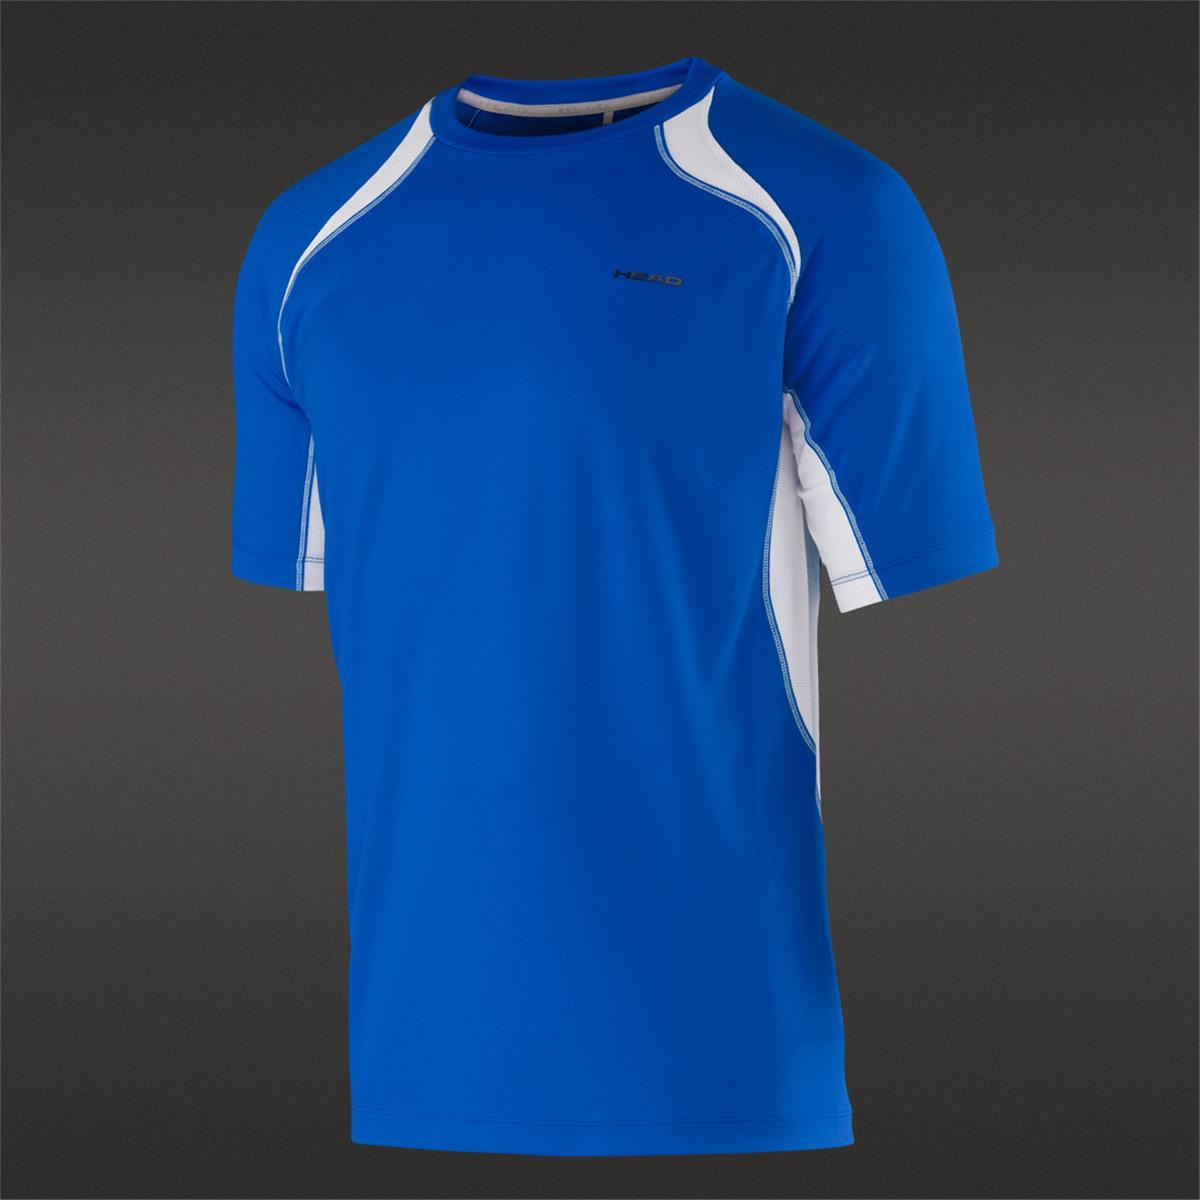 Head Boys Club Technical T Shirt Torch Tshirt Women Blue Black Navy M